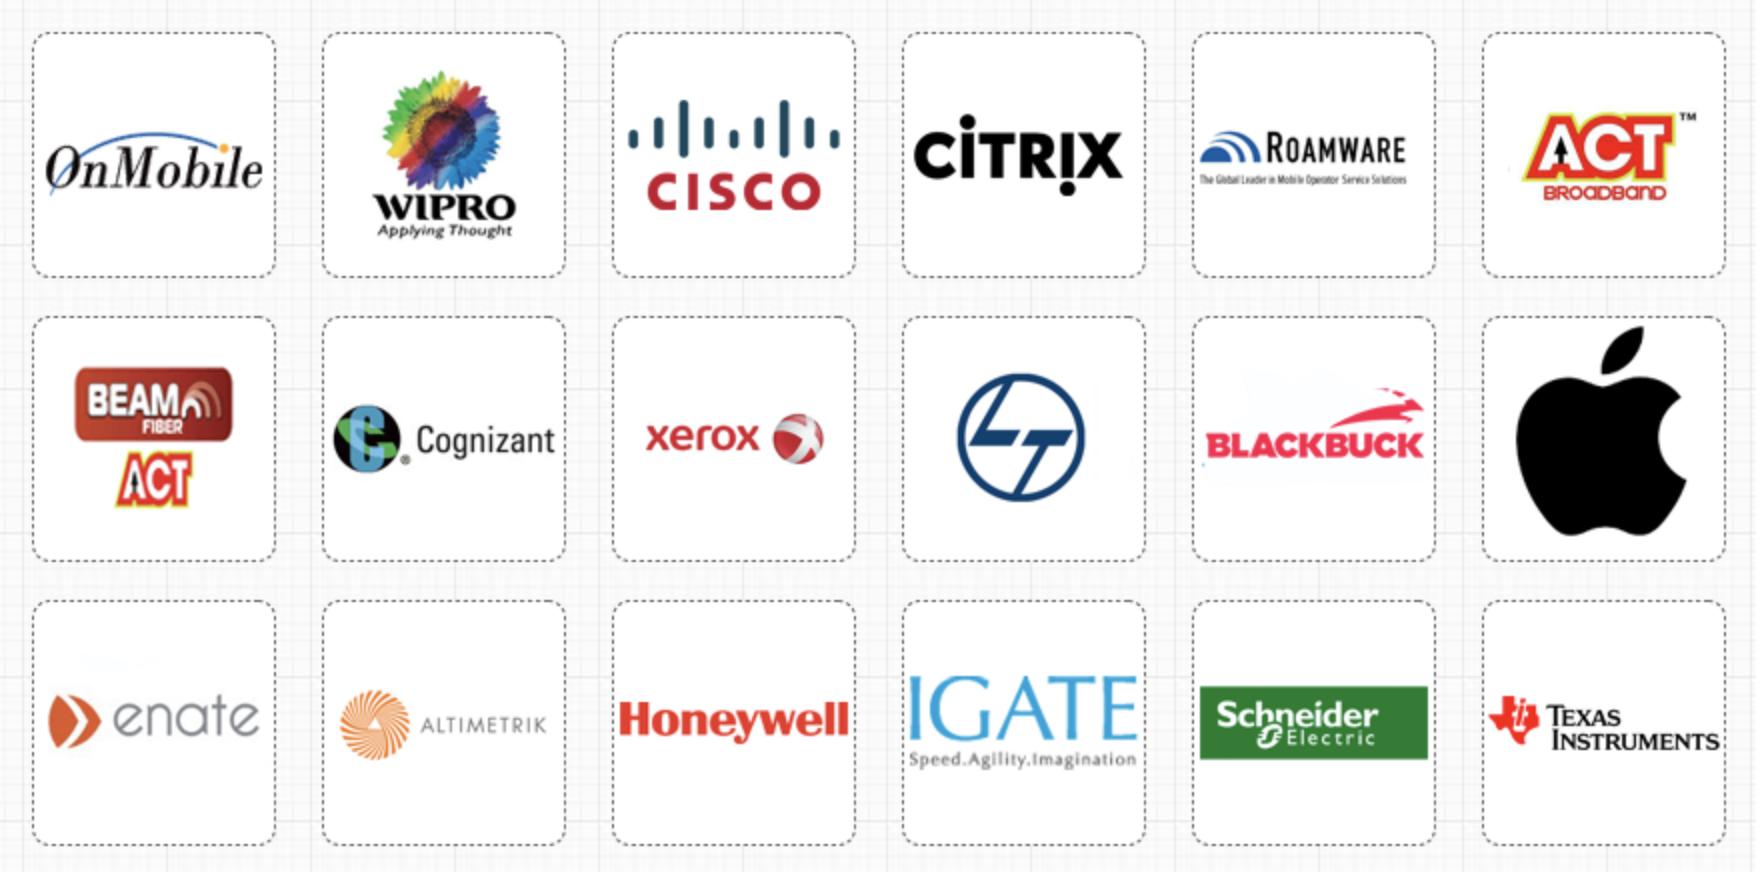 Geek Creative Agency Clients - Digital Marketing Agencies in Bangalore